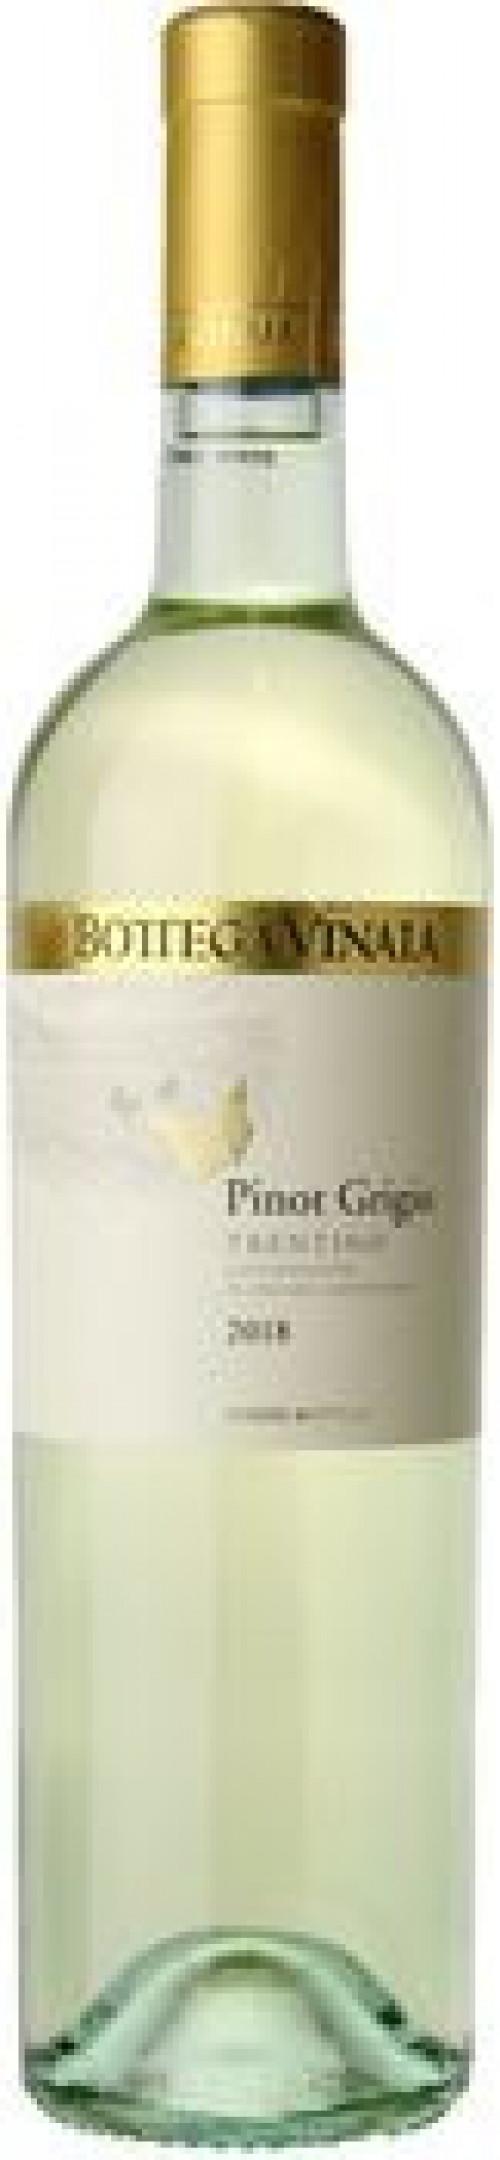 Bottega Vinaia Pinot Grigio 750ml